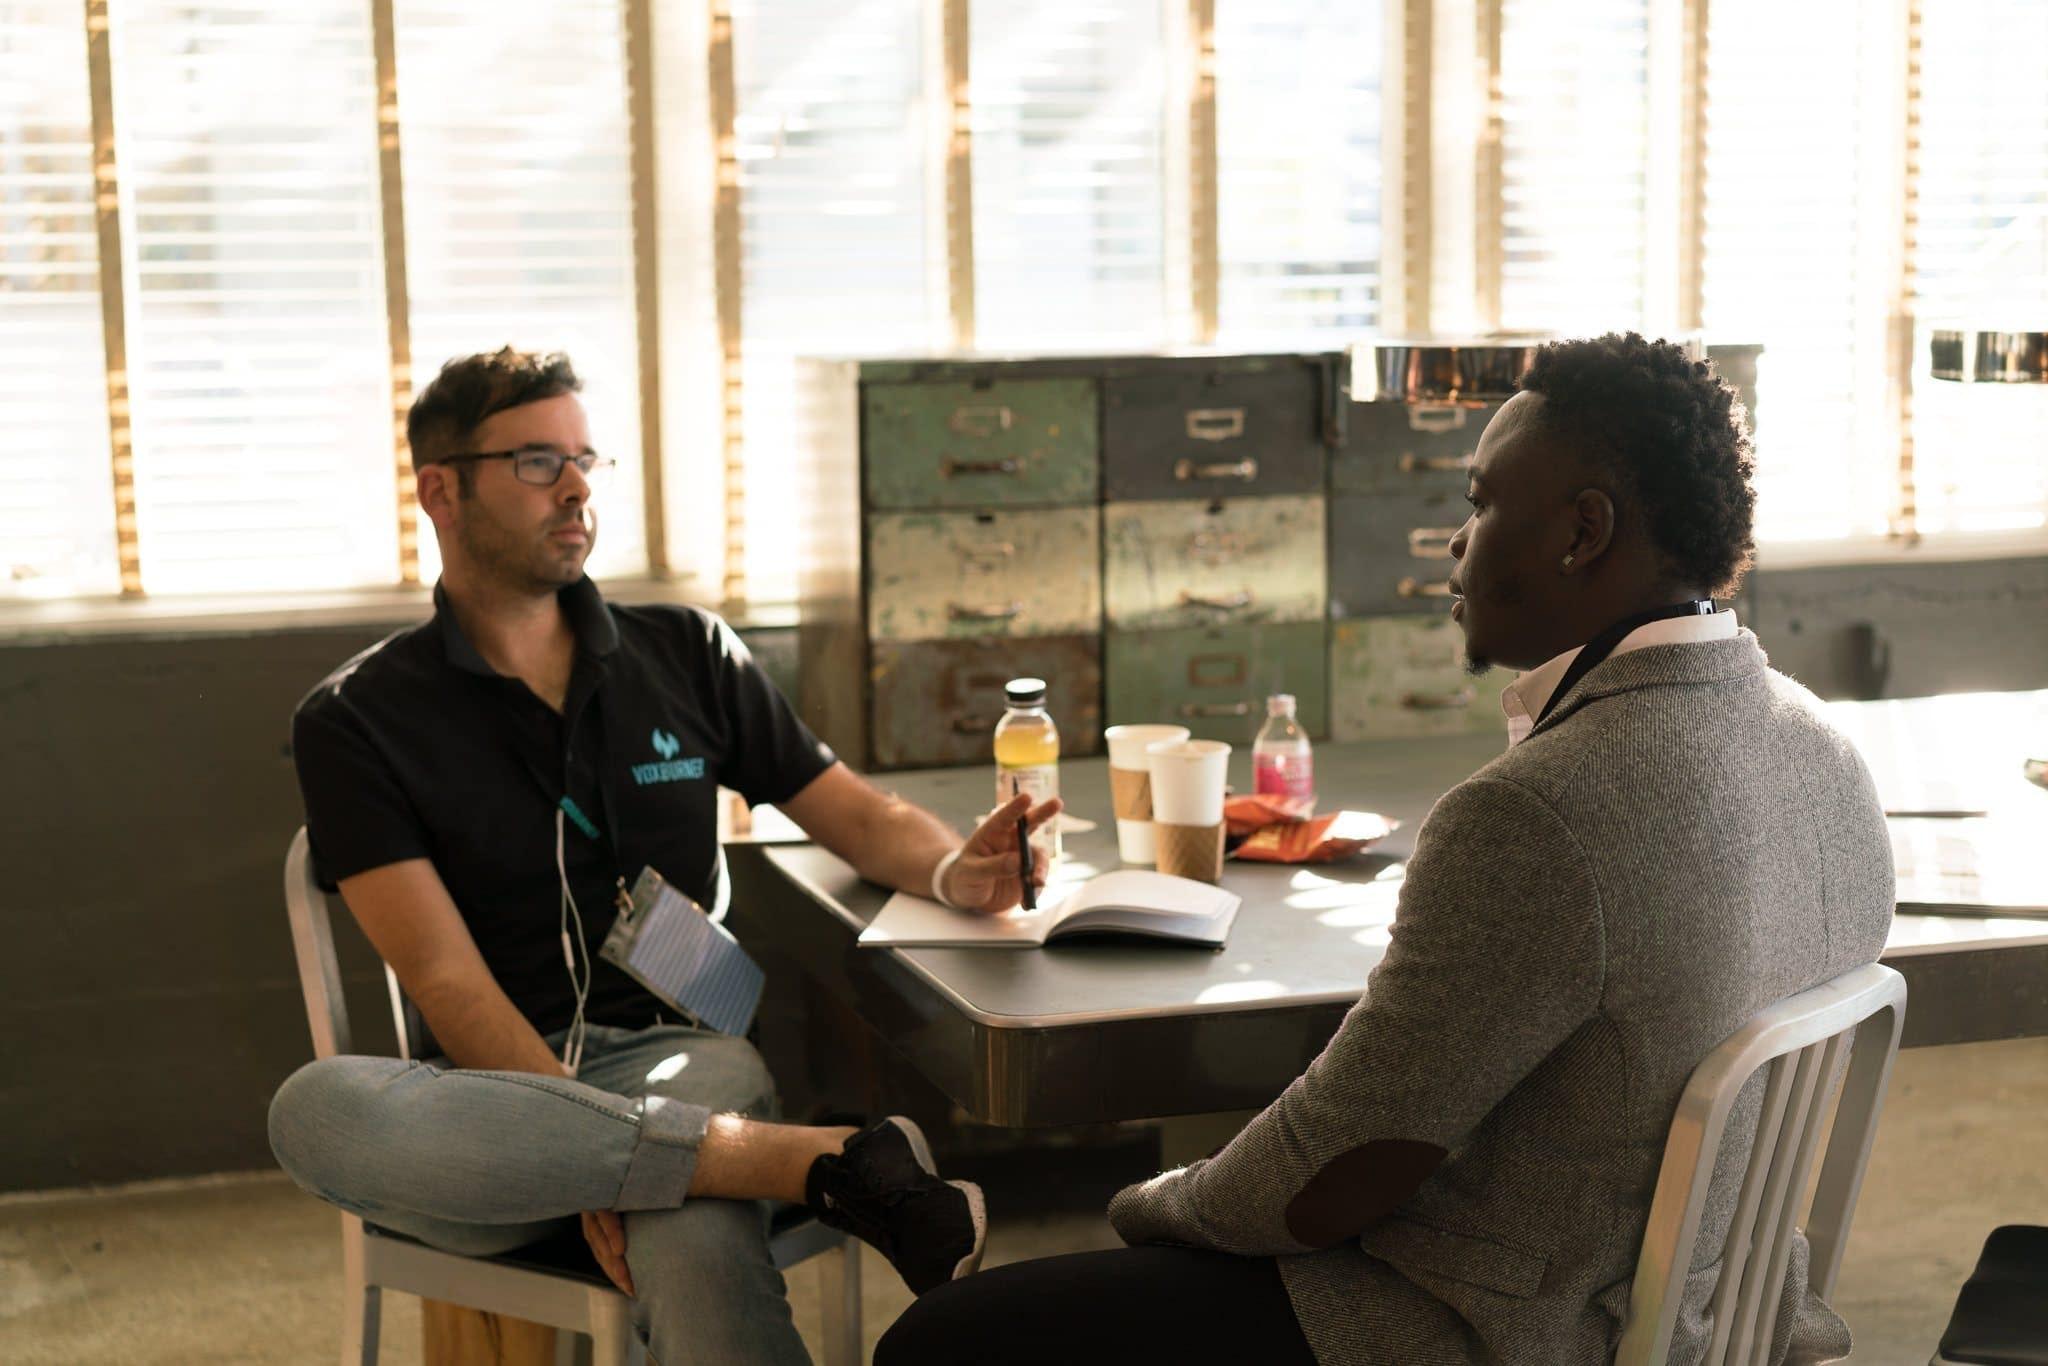 3 Employee Engagement Ideas to Improve Retention